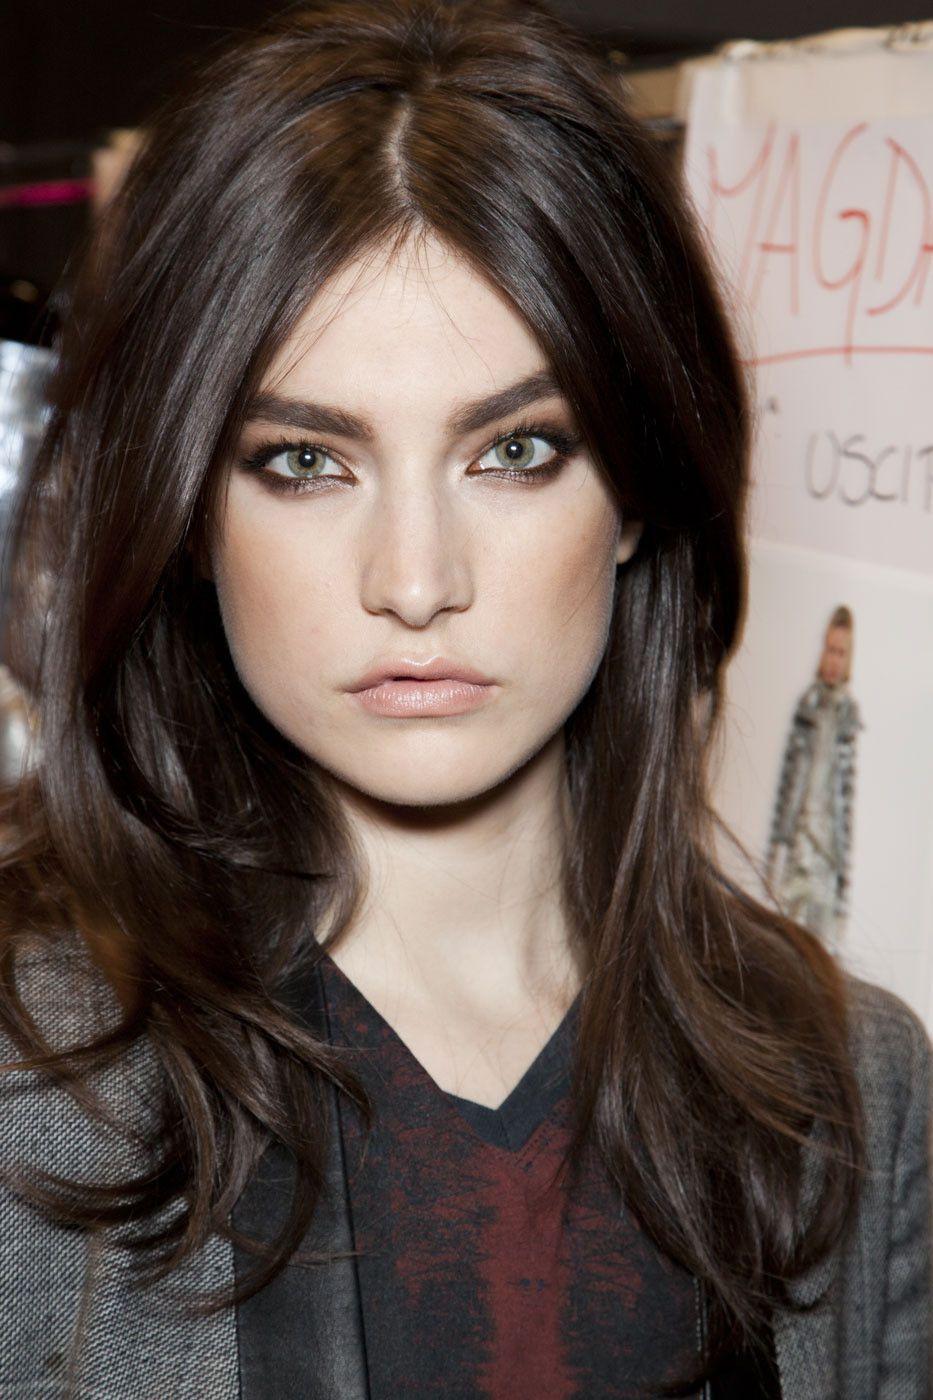 Jacqueline Jablonski - Layered Mid-Length Hairstyle | Hair styles ...